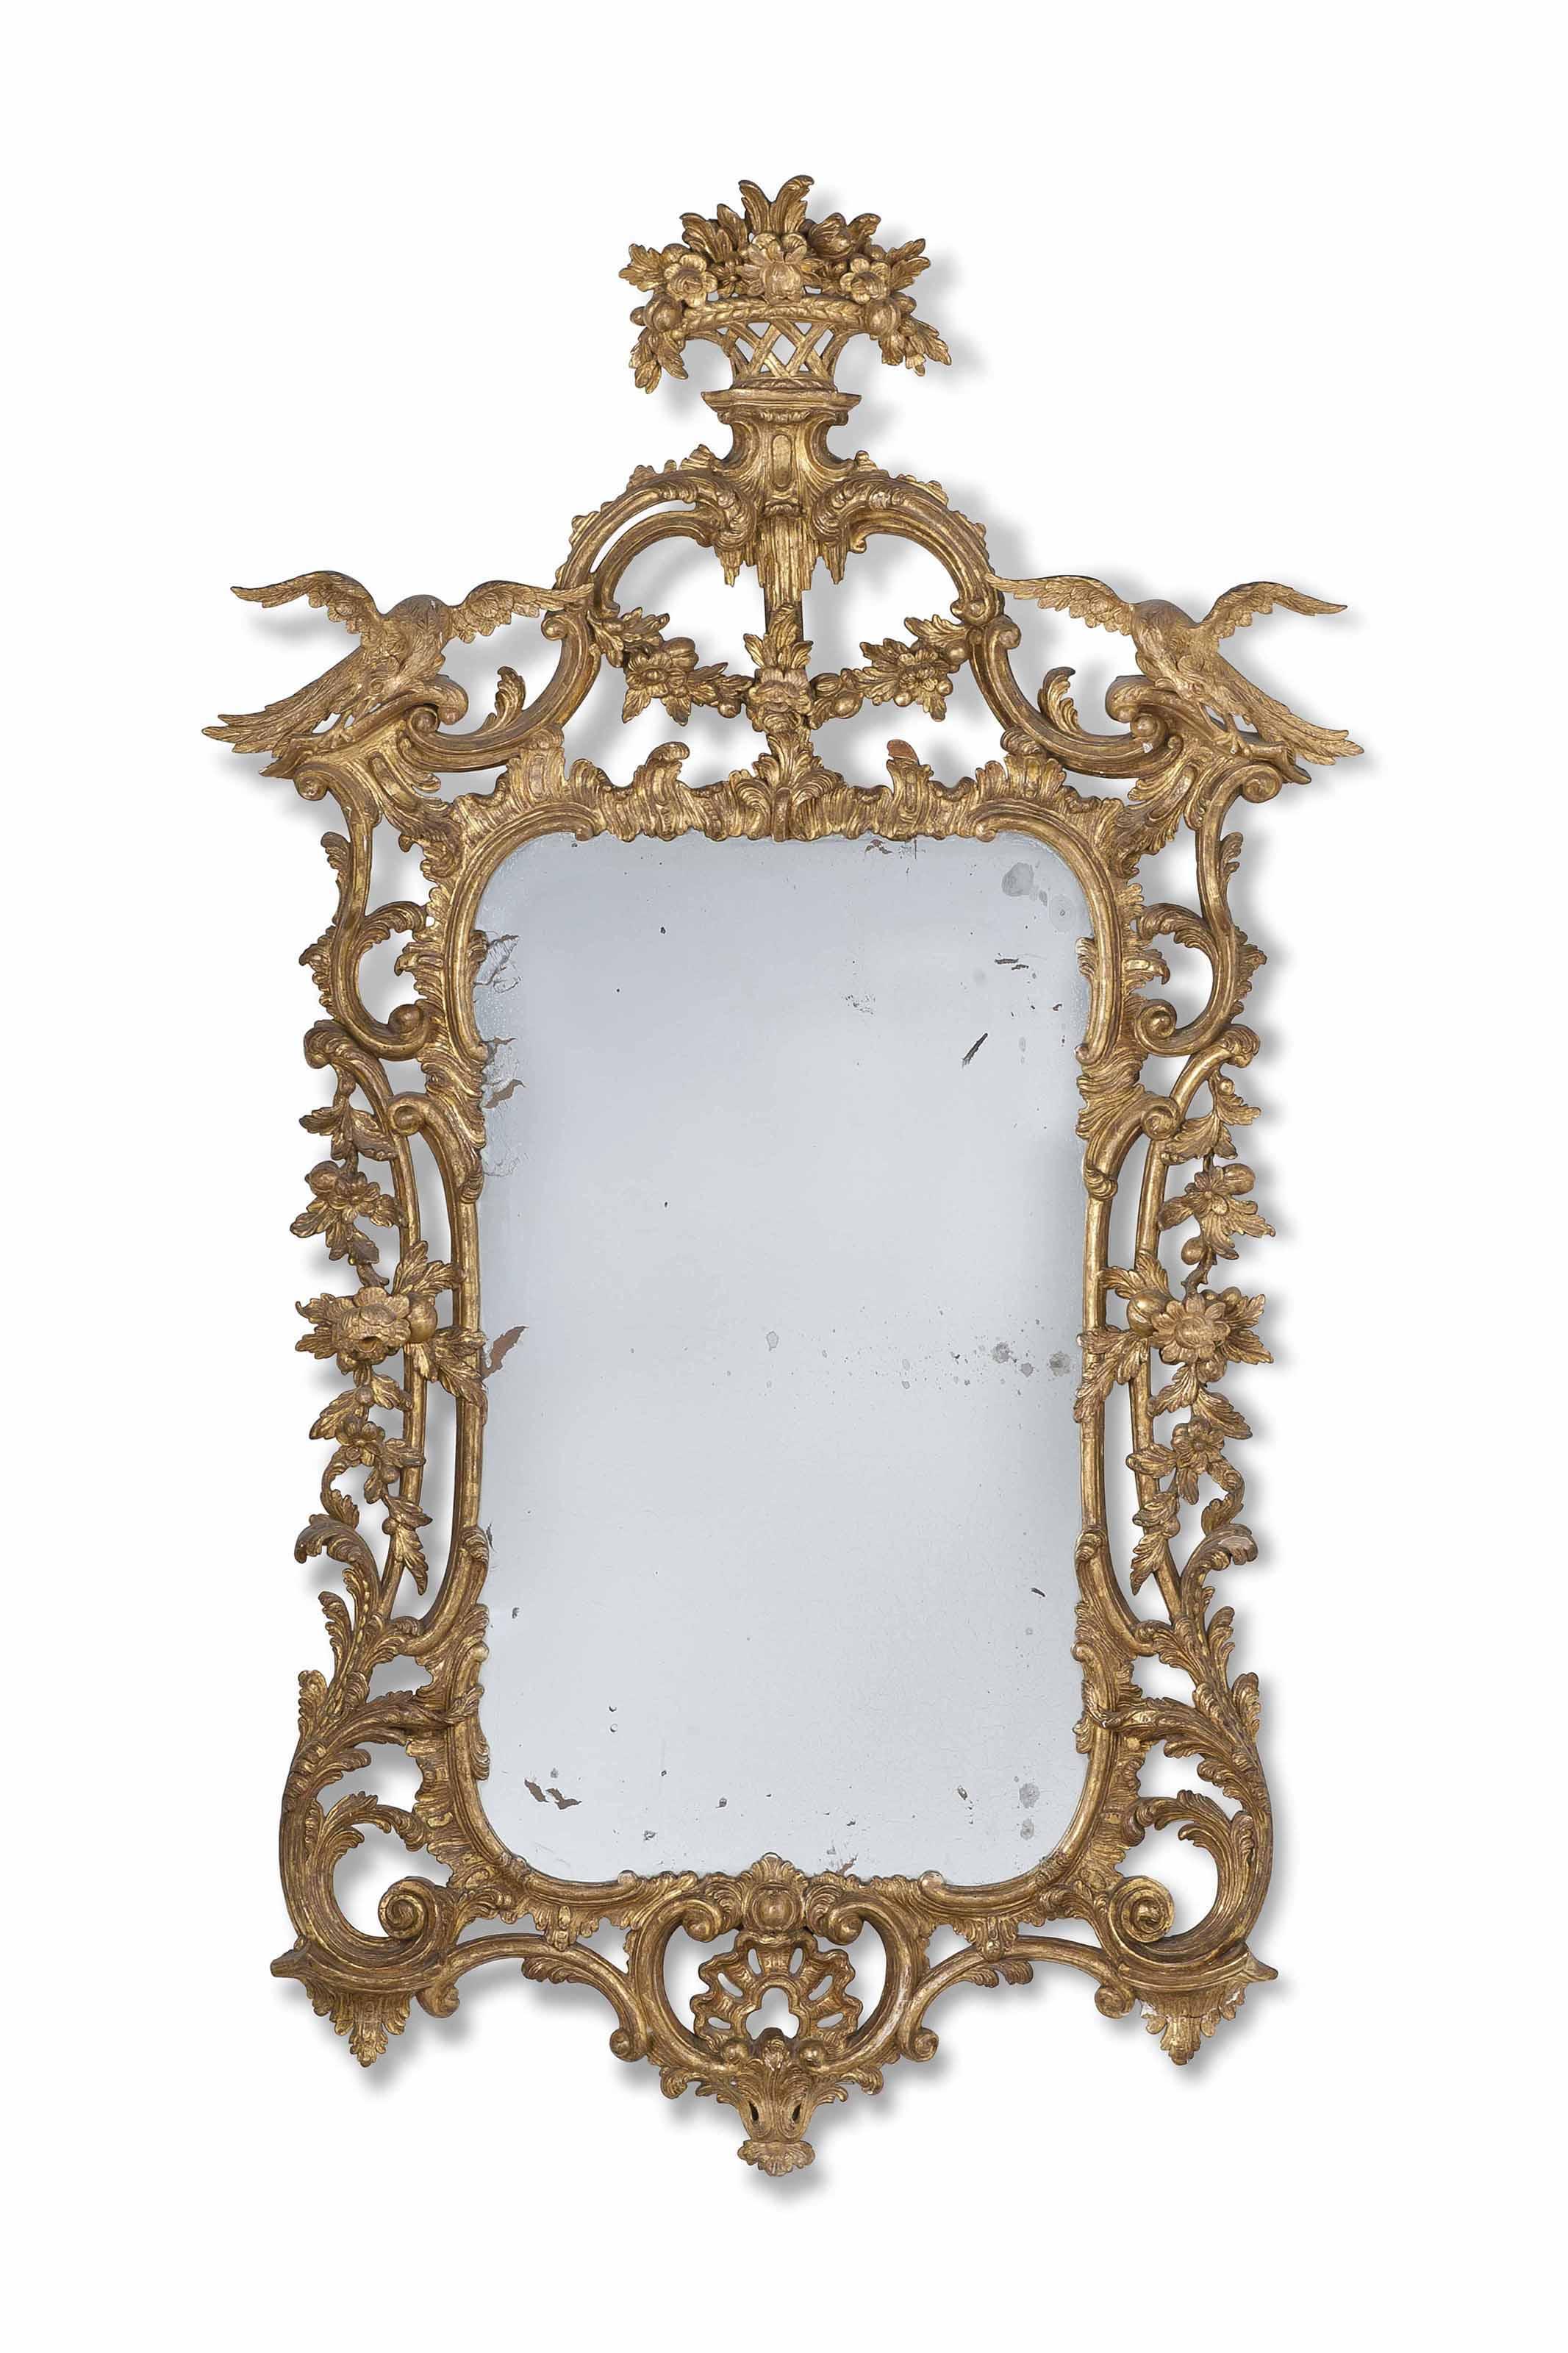 George III Giltwood mirror, c.1755Faringdon House